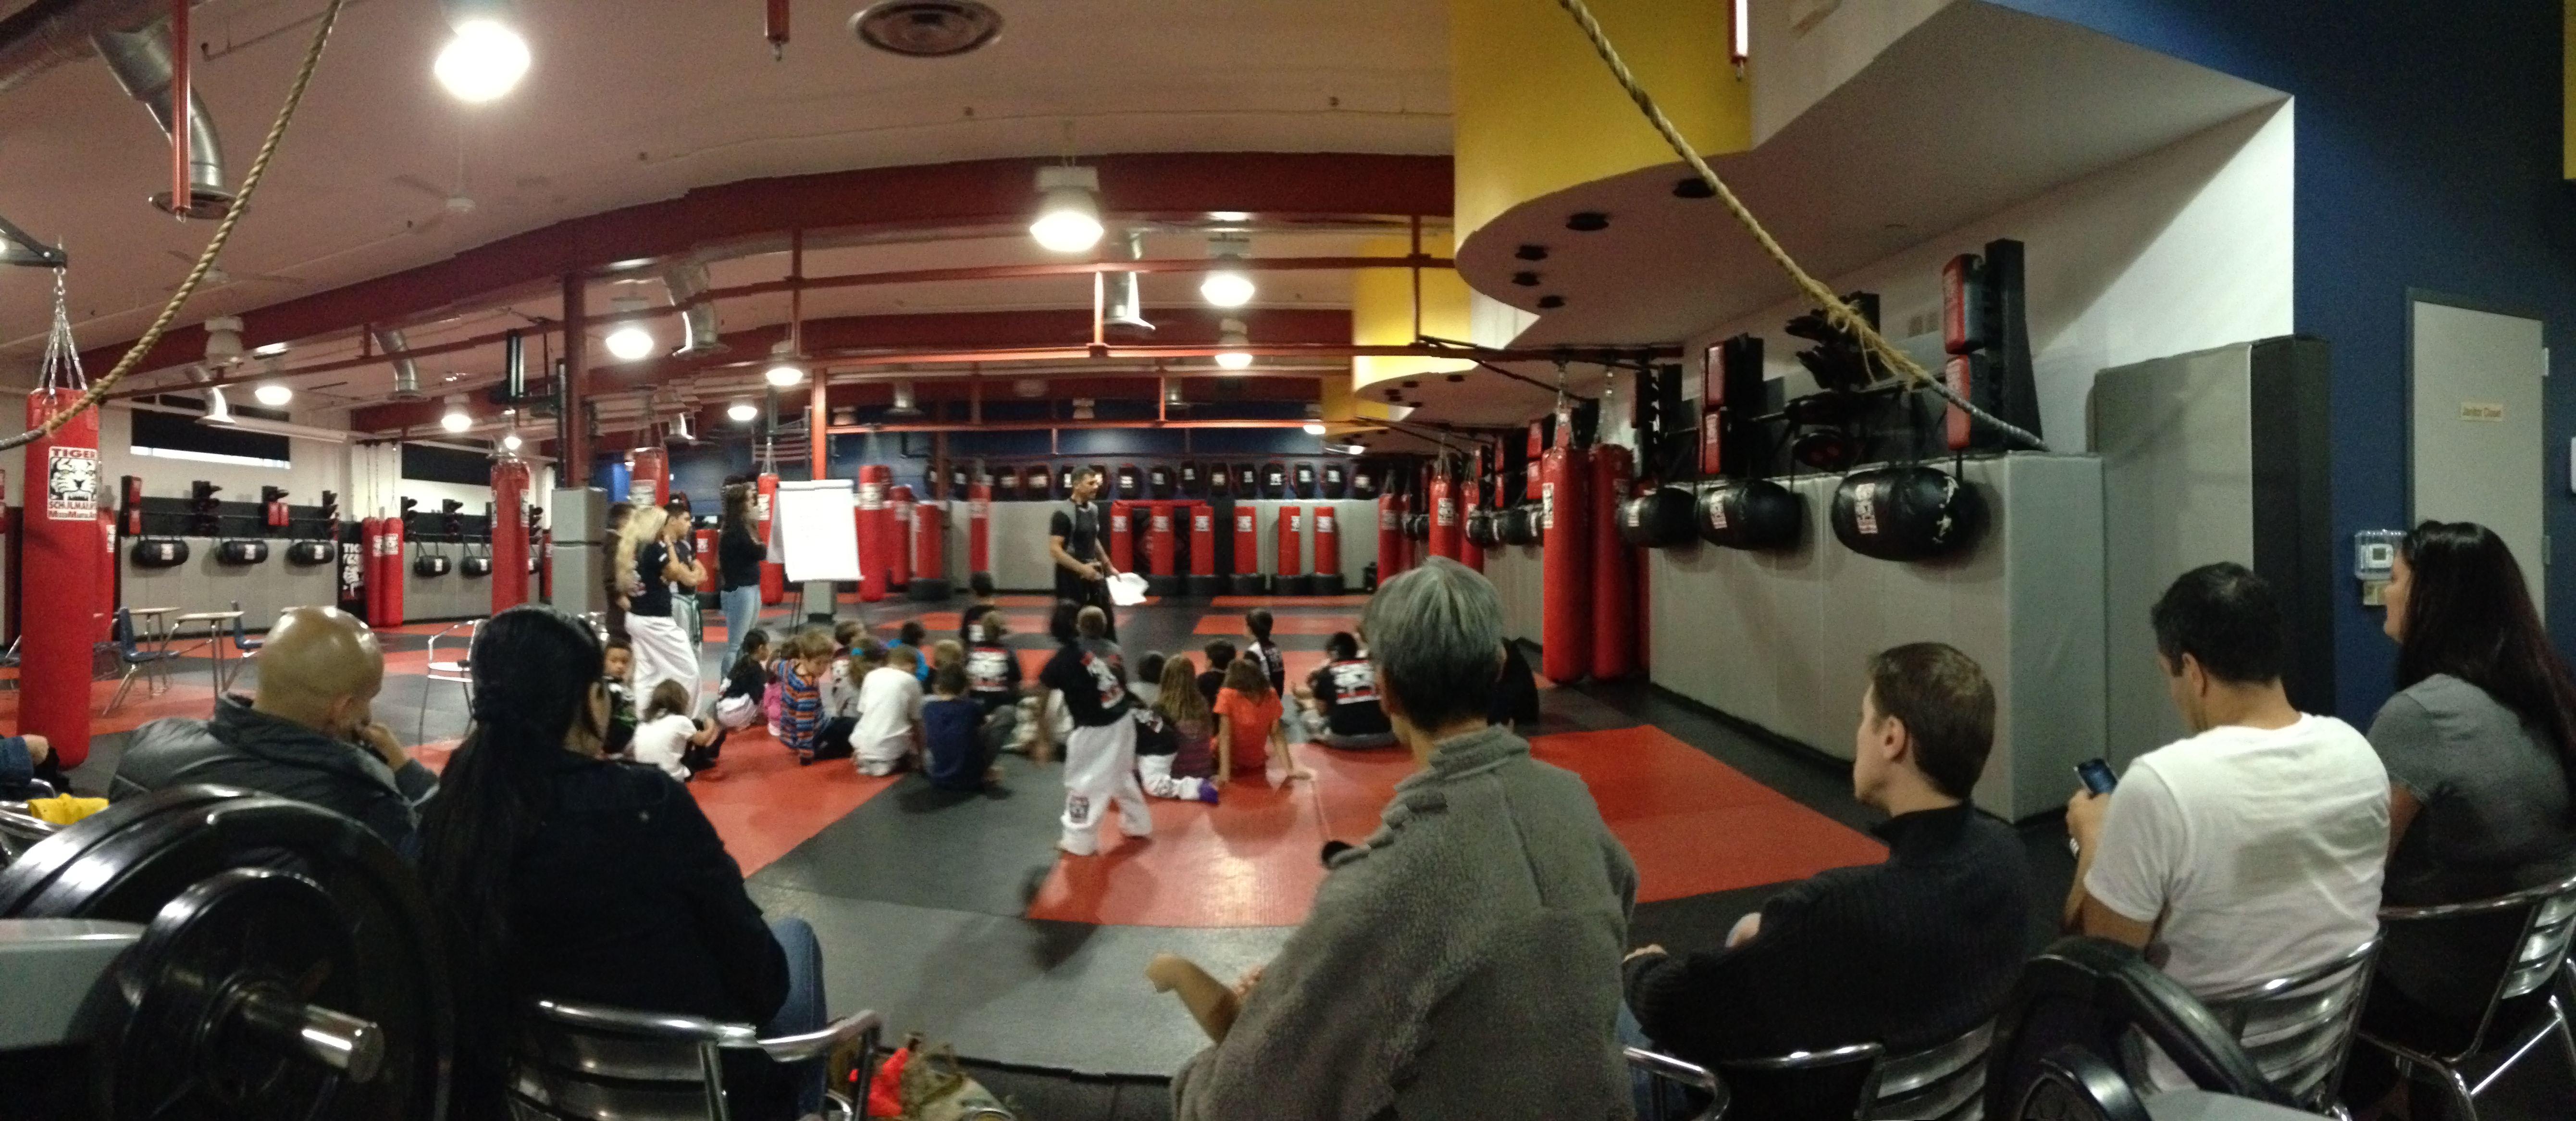 Tiger Schulmann's Martial Arts | Audience Photo